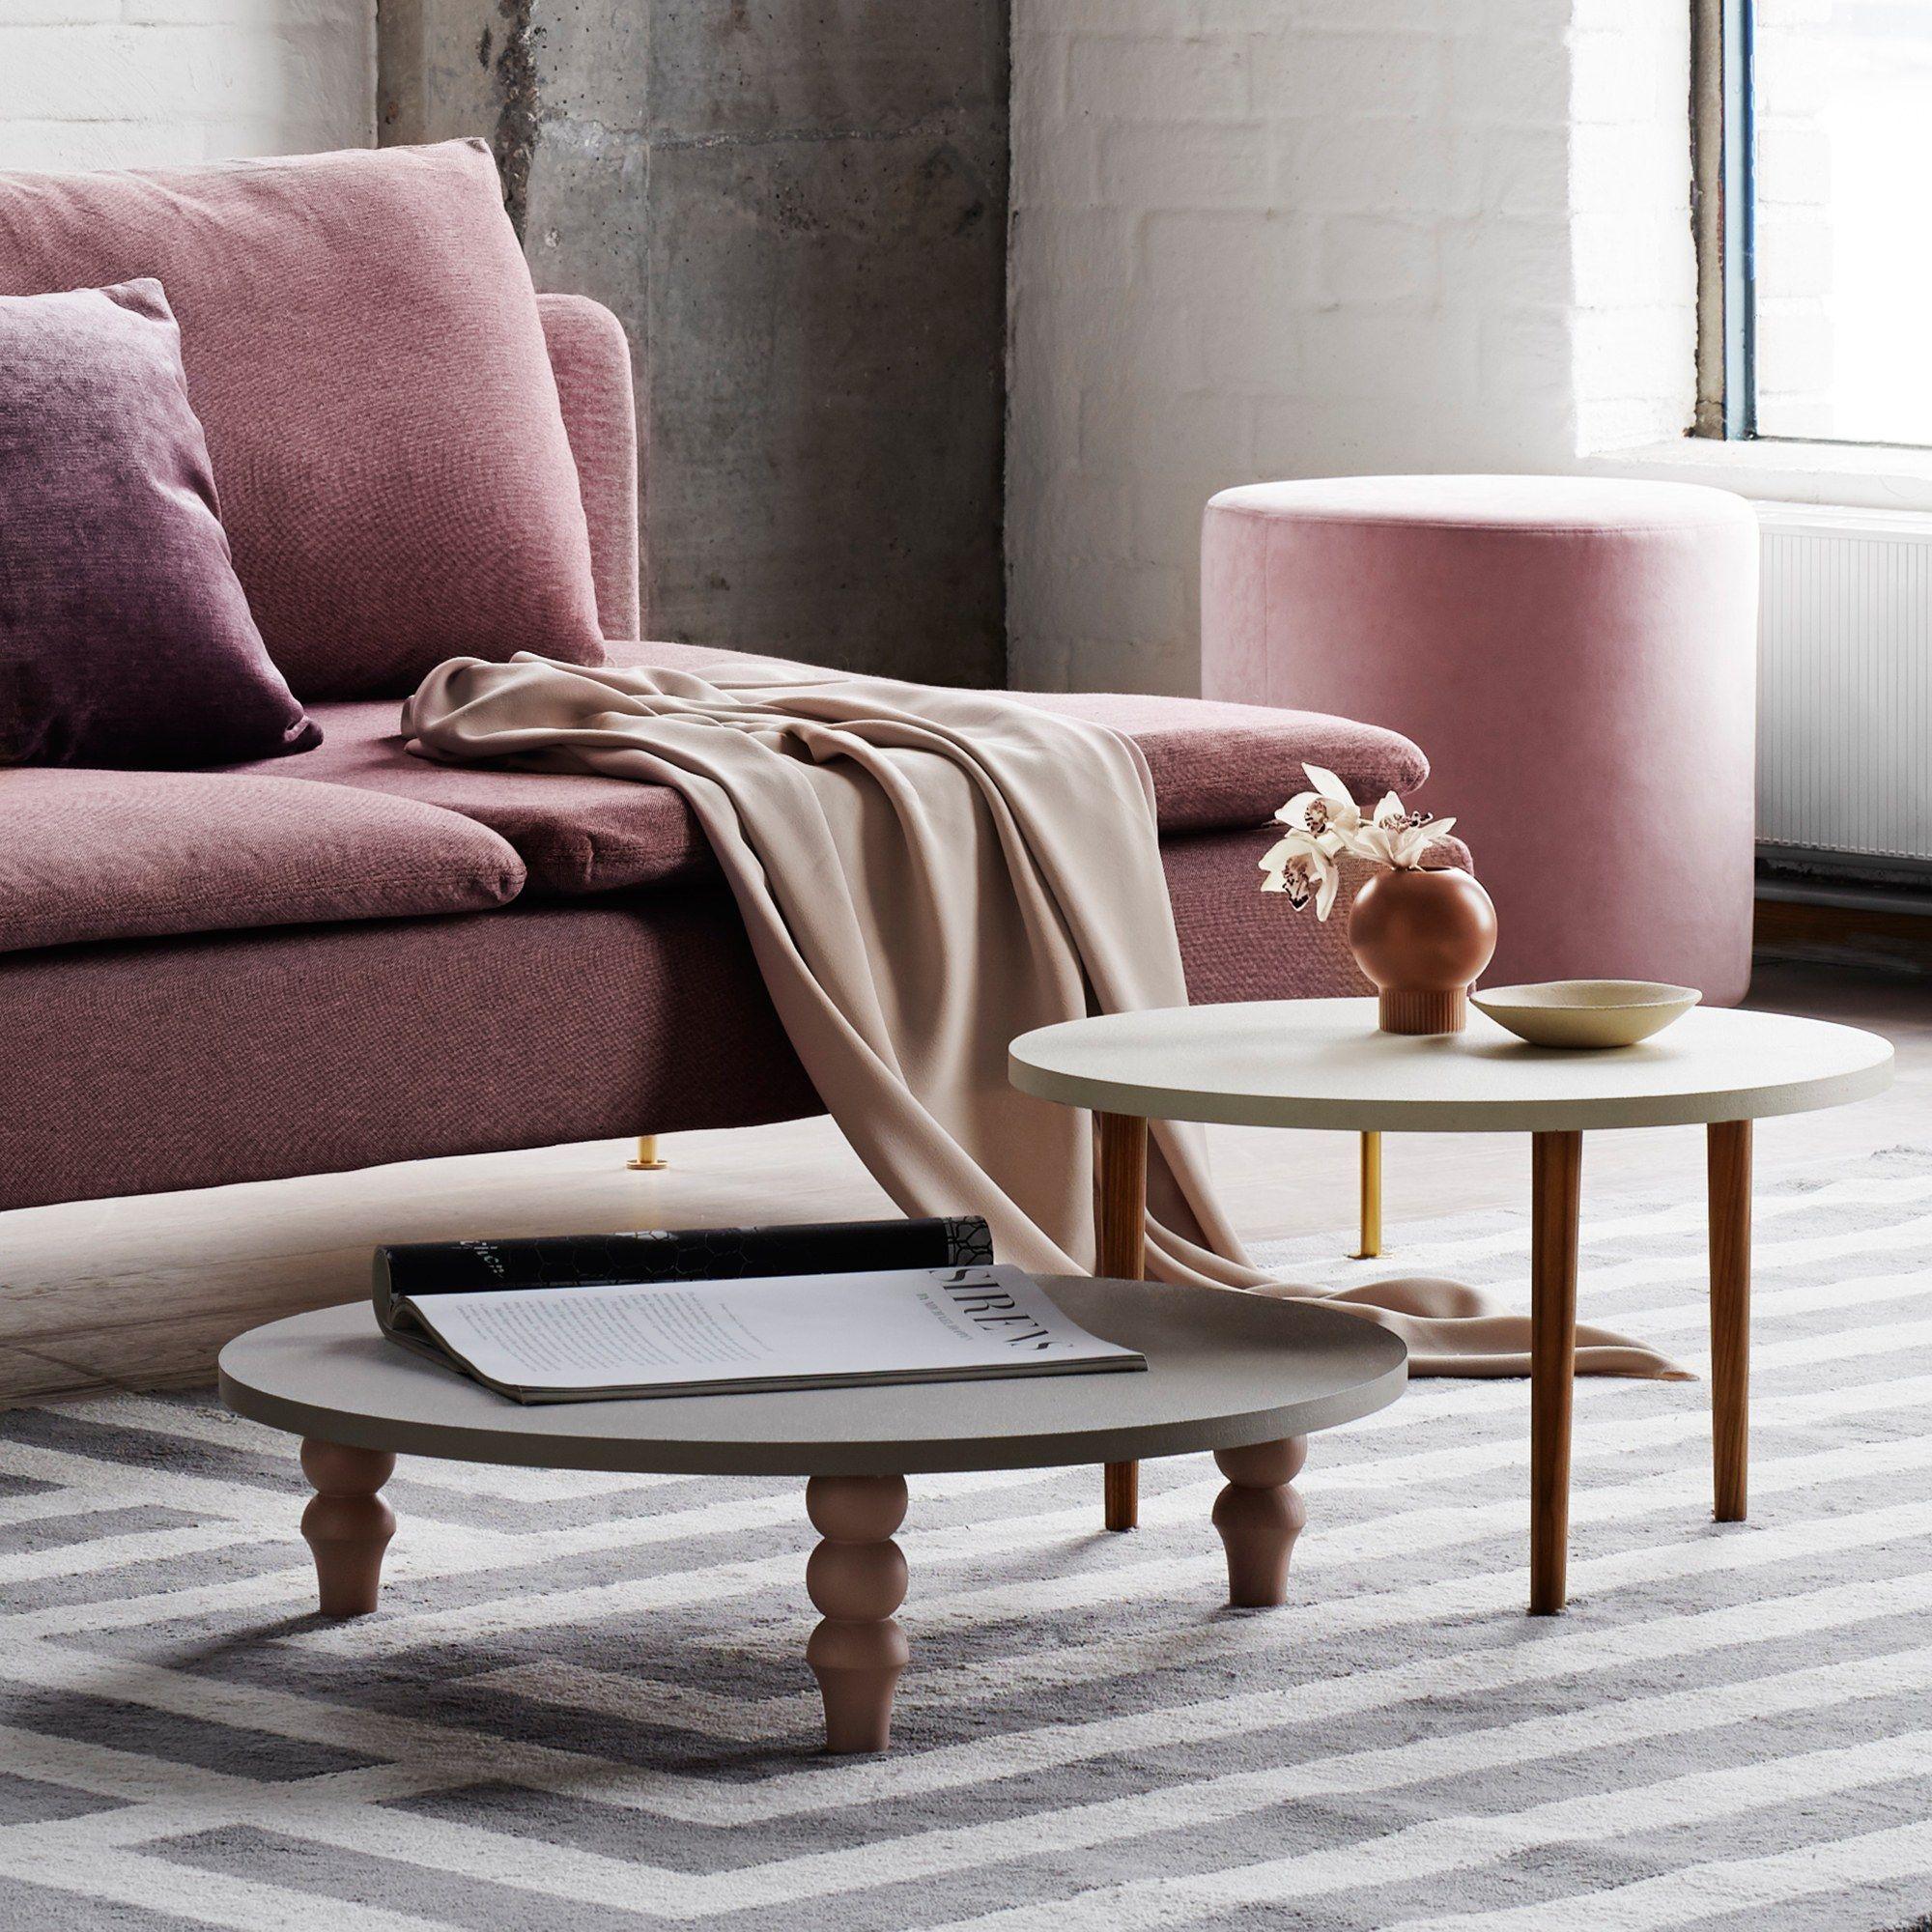 5 Companies That Will Make Your Ikea Furniture Seem Custom